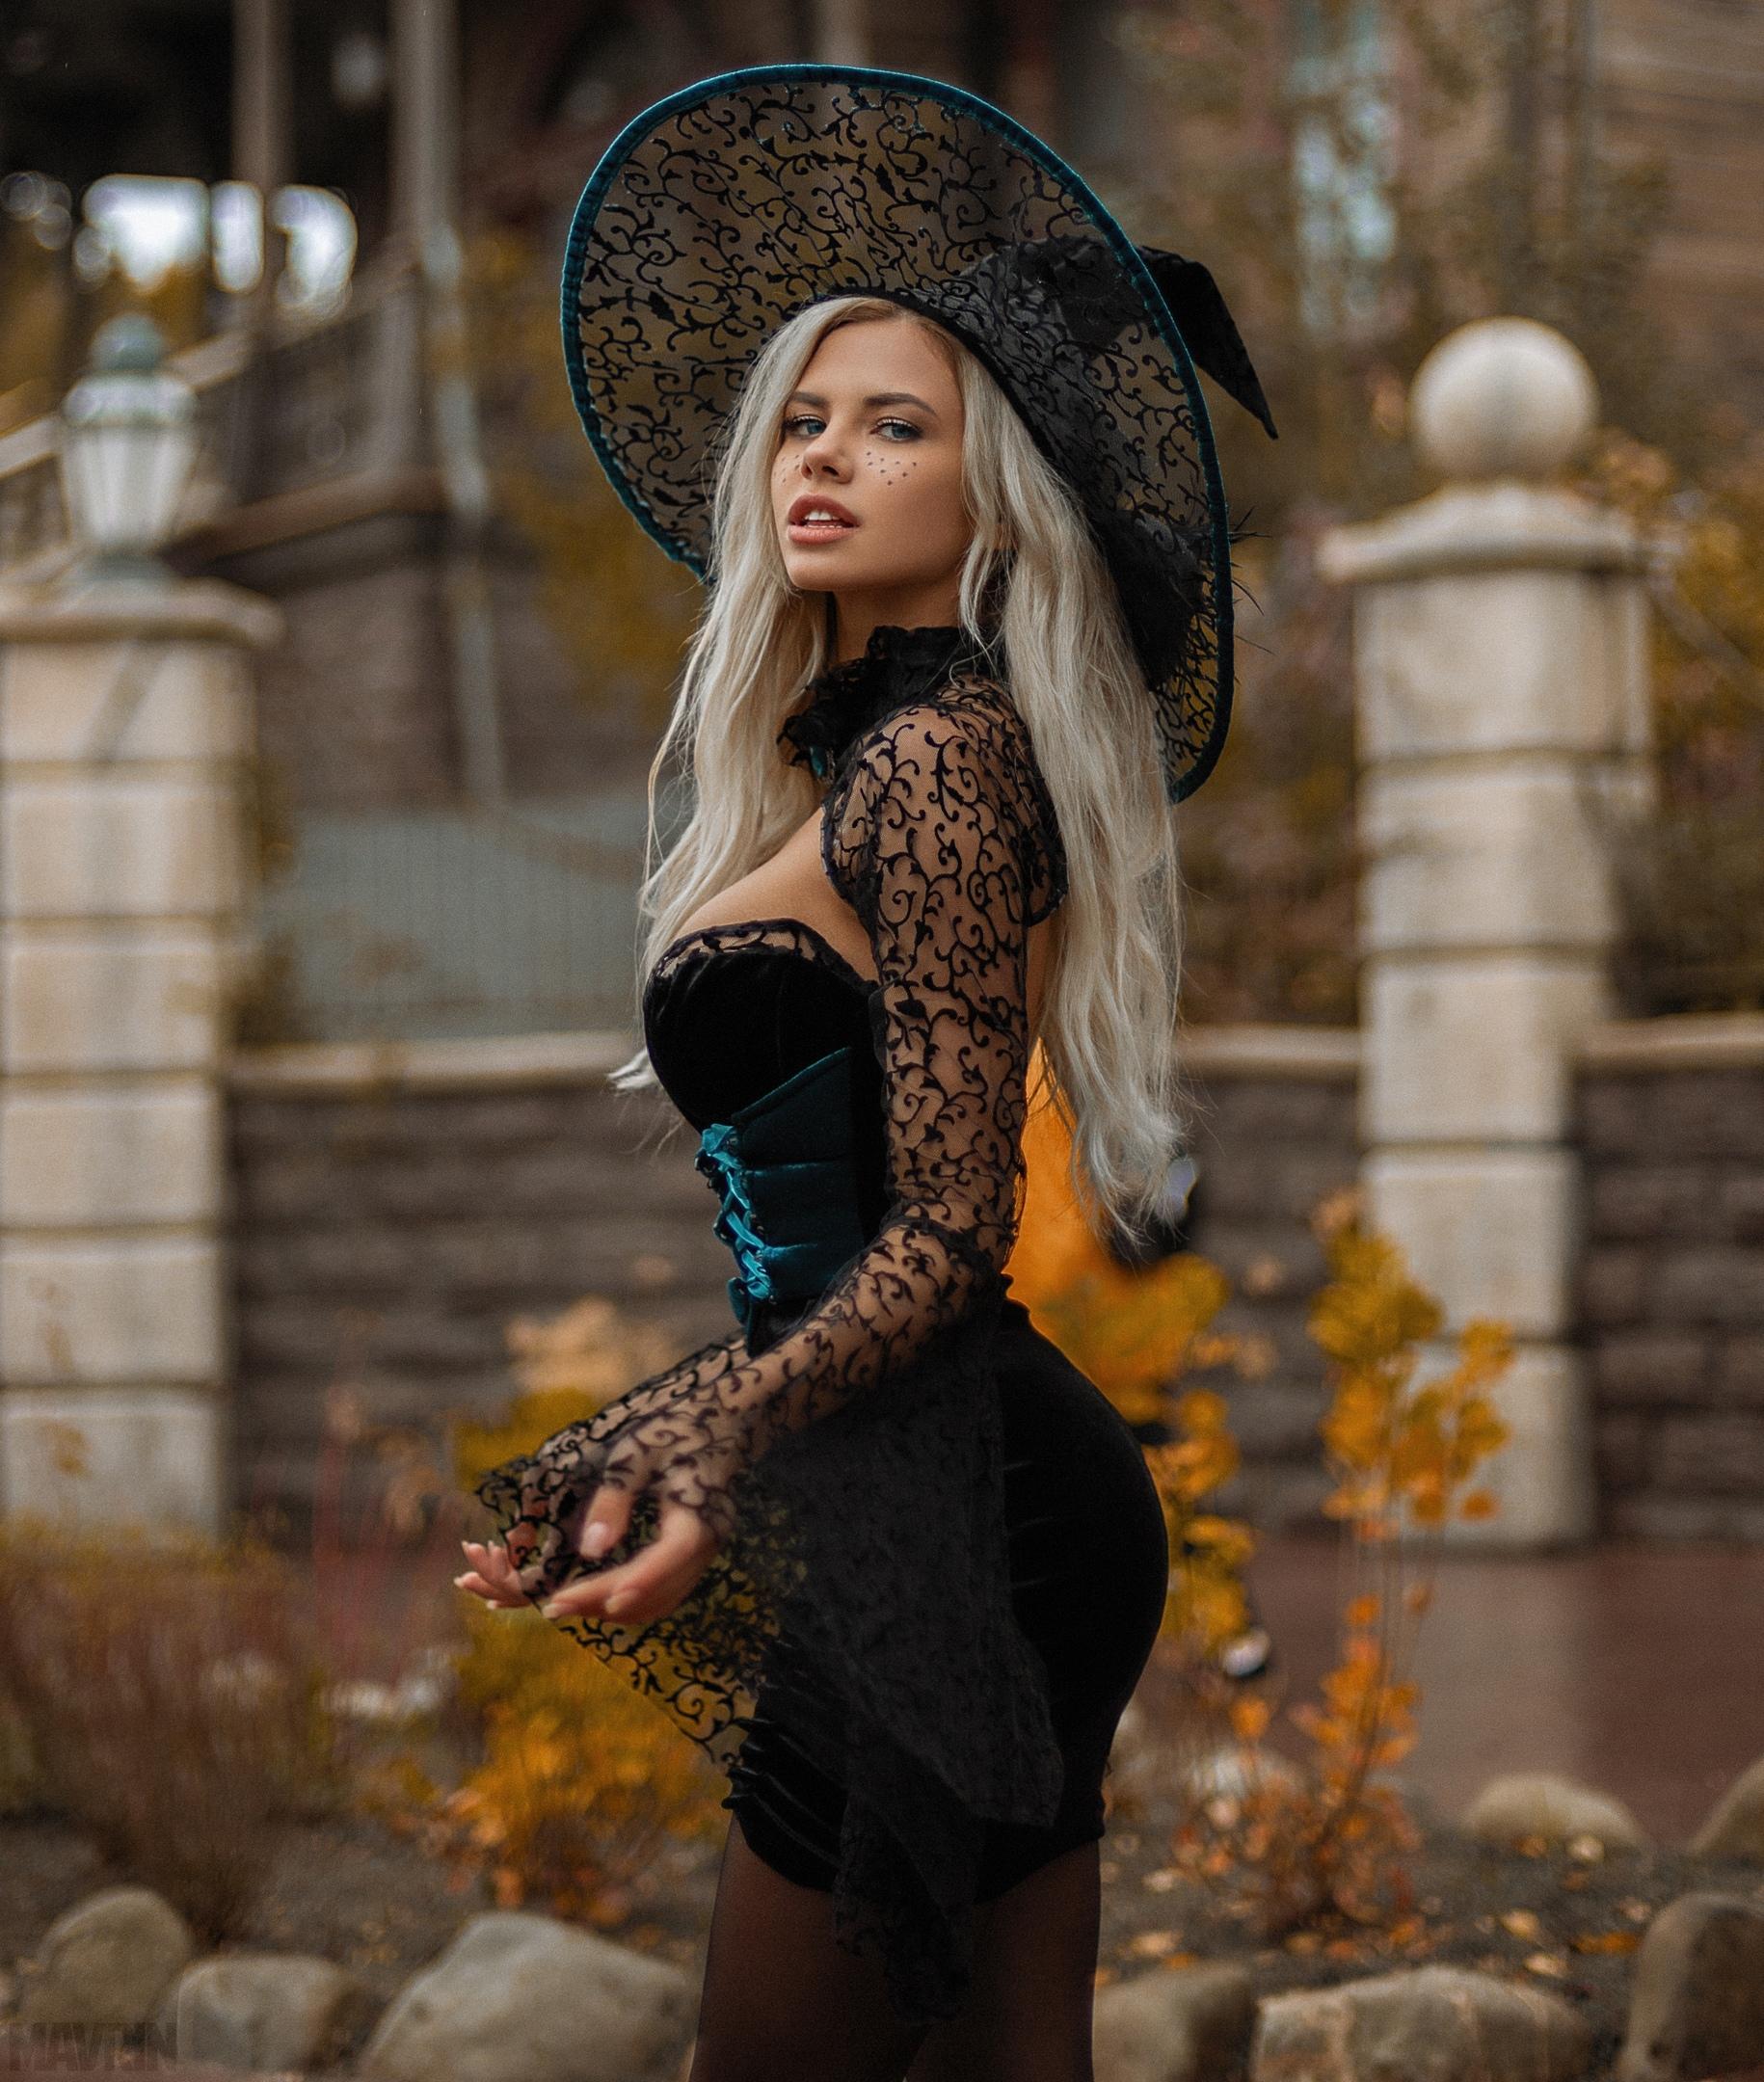 People 1830x2160 Nata Lee women outdoors Russian women model Aleksandr Mavrin women portrait display blonde dress hat standing looking at viewer black dress